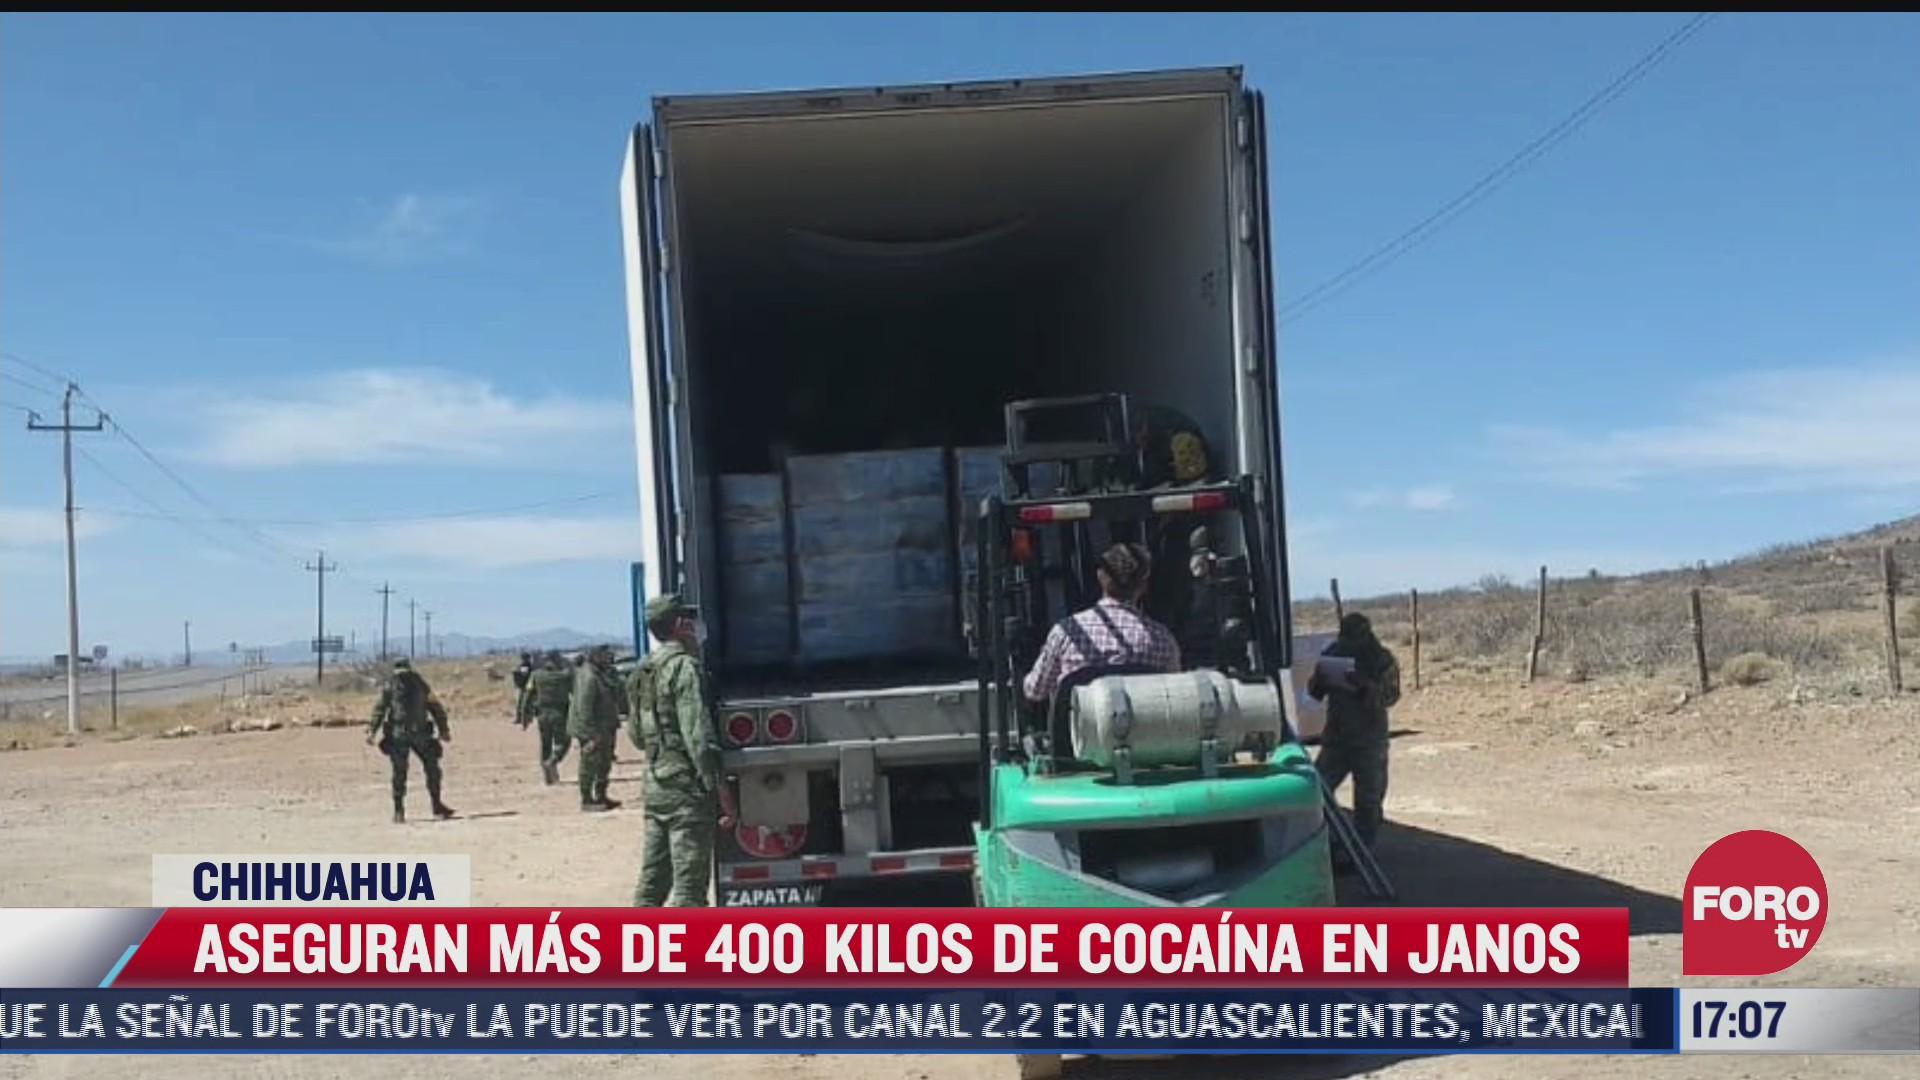 aseguran 400 kilos de cocaina en chihuahua